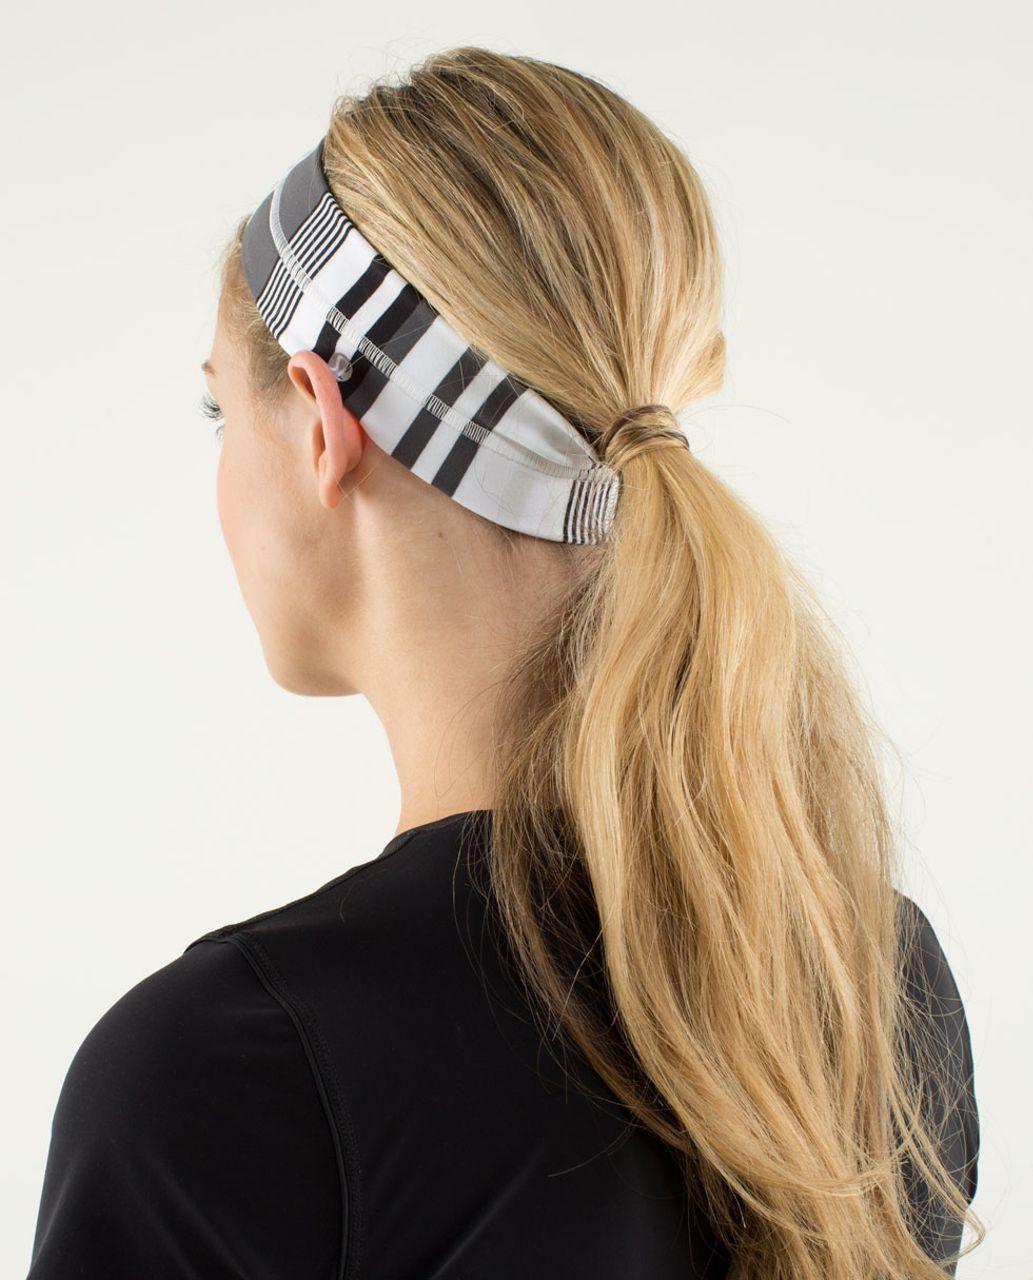 Lululemon Fly Away Tamer Headband - Groovy Stripe Nimbus